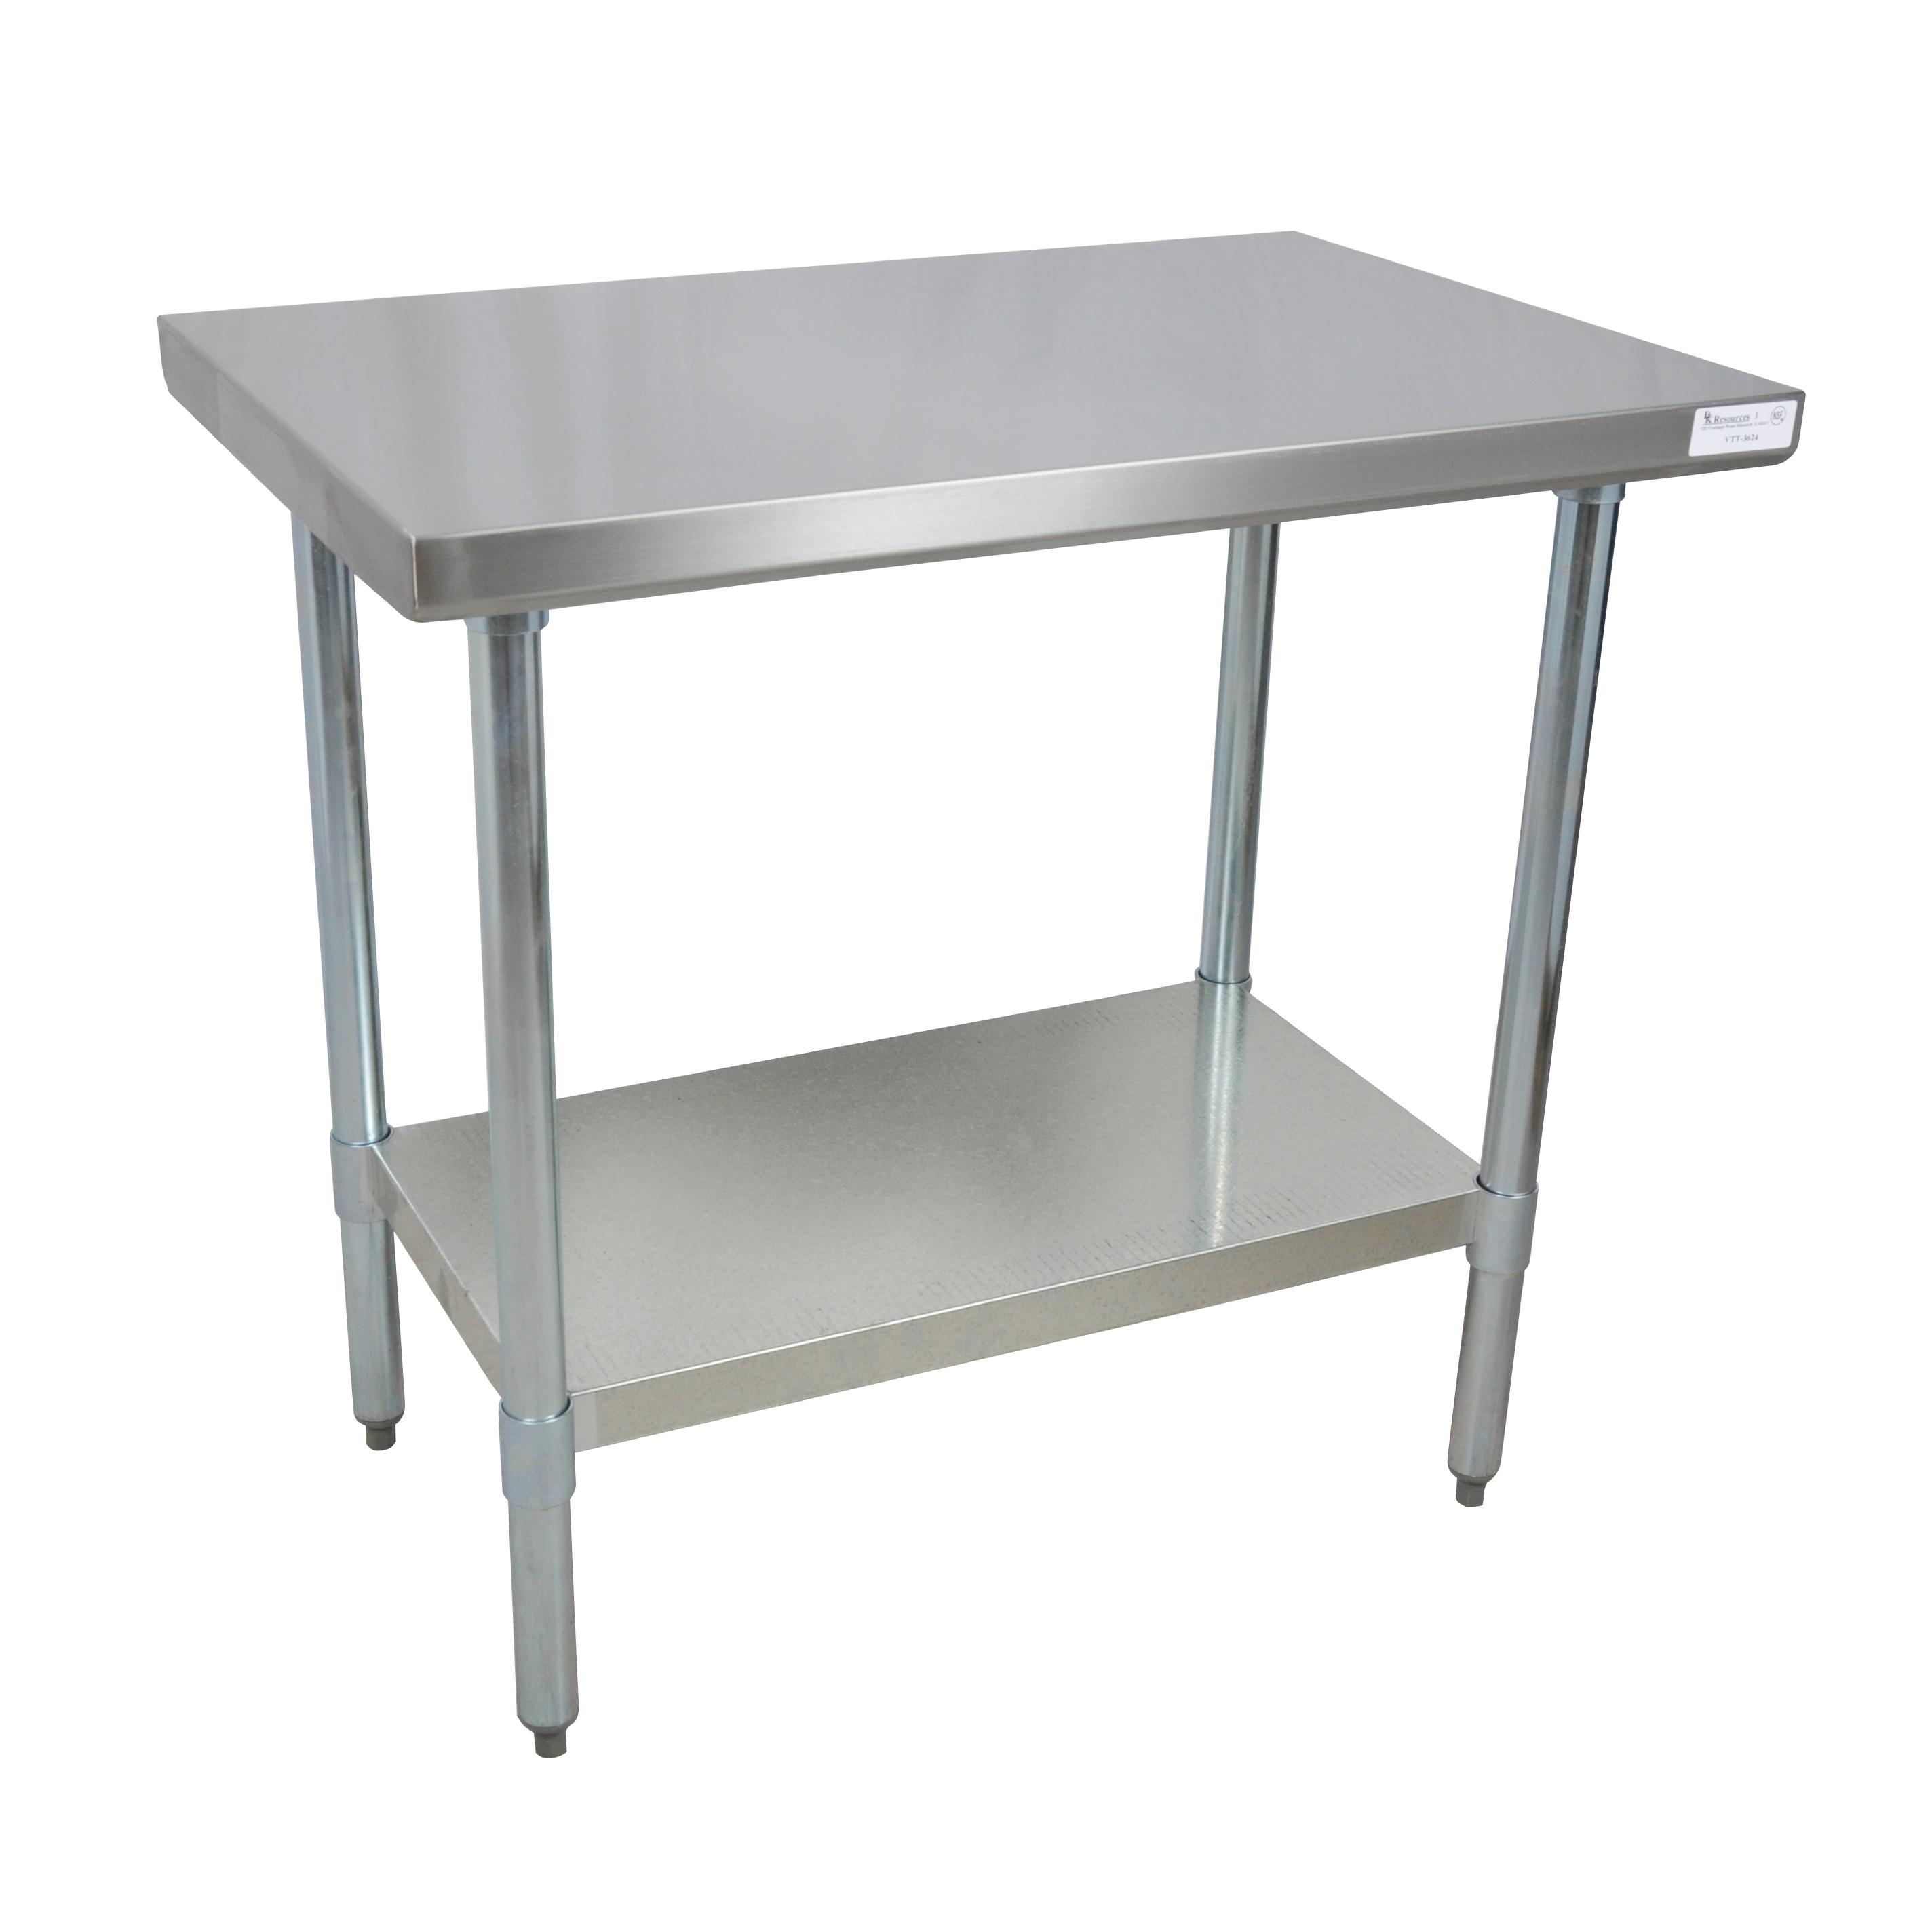 BK Resources CTT-4836 work table,  40